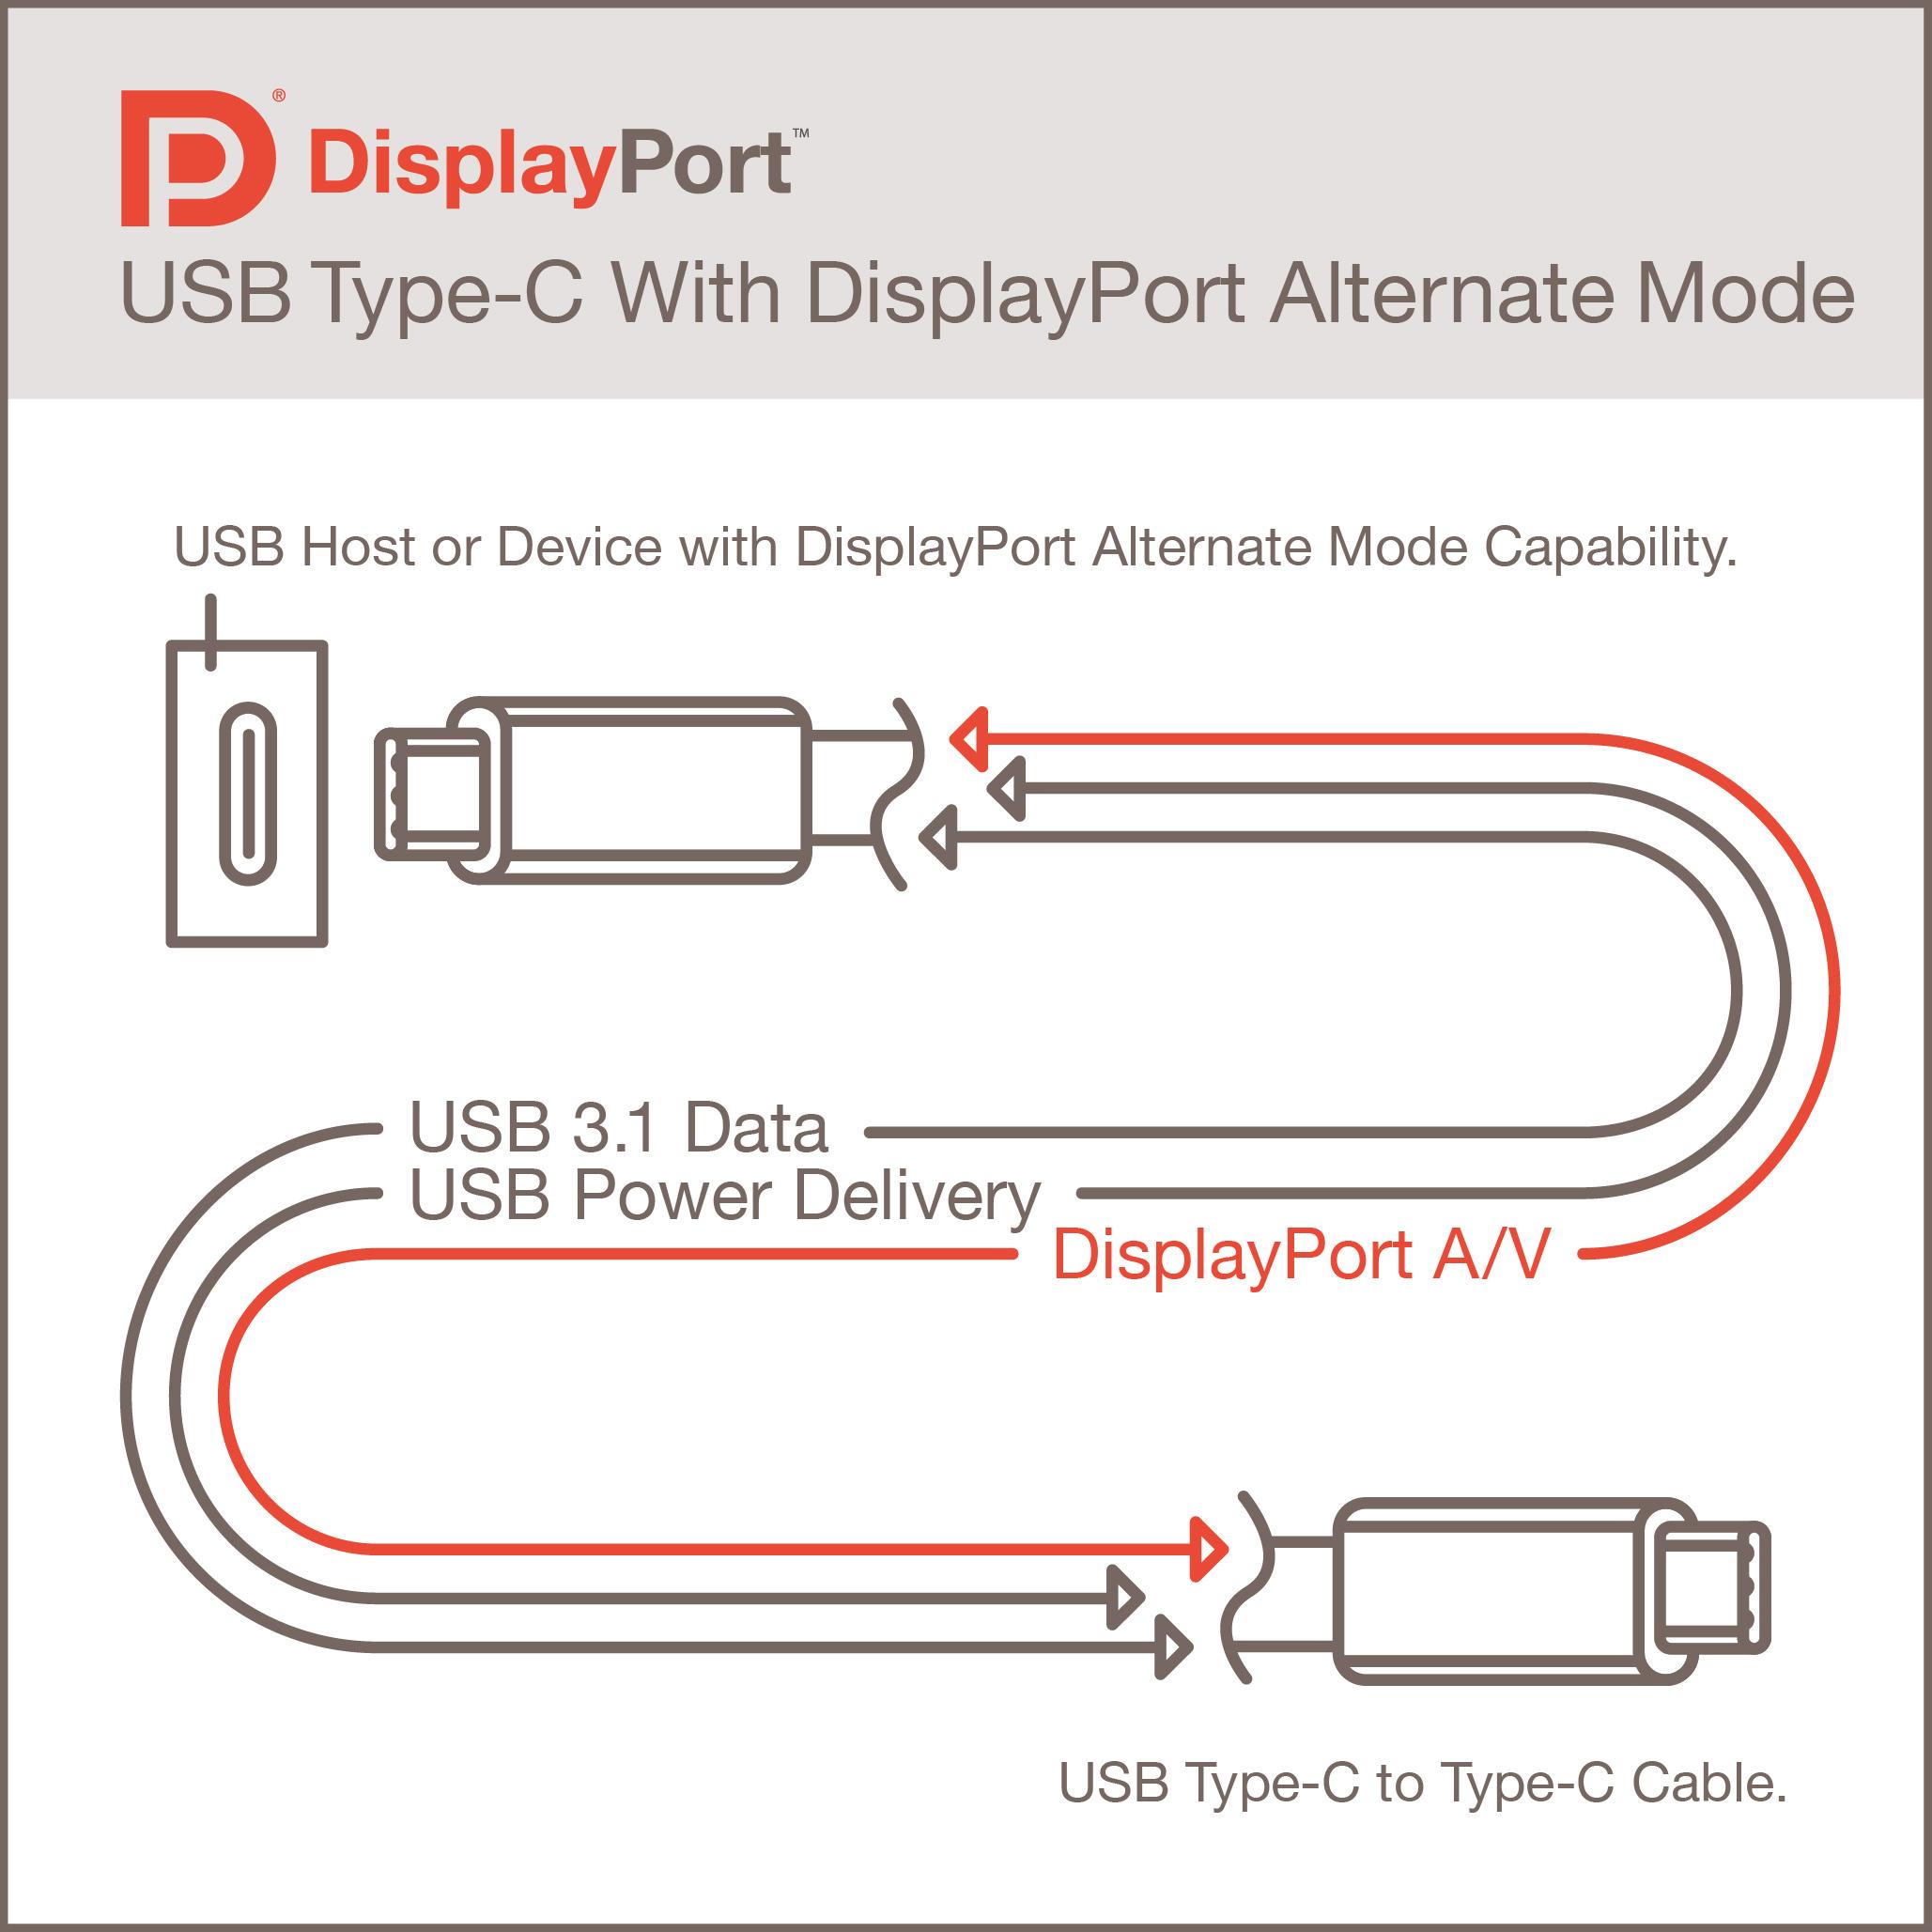 Wiring Diagram For Displayport   Wiring Library - Usb Type C Wiring Diagram